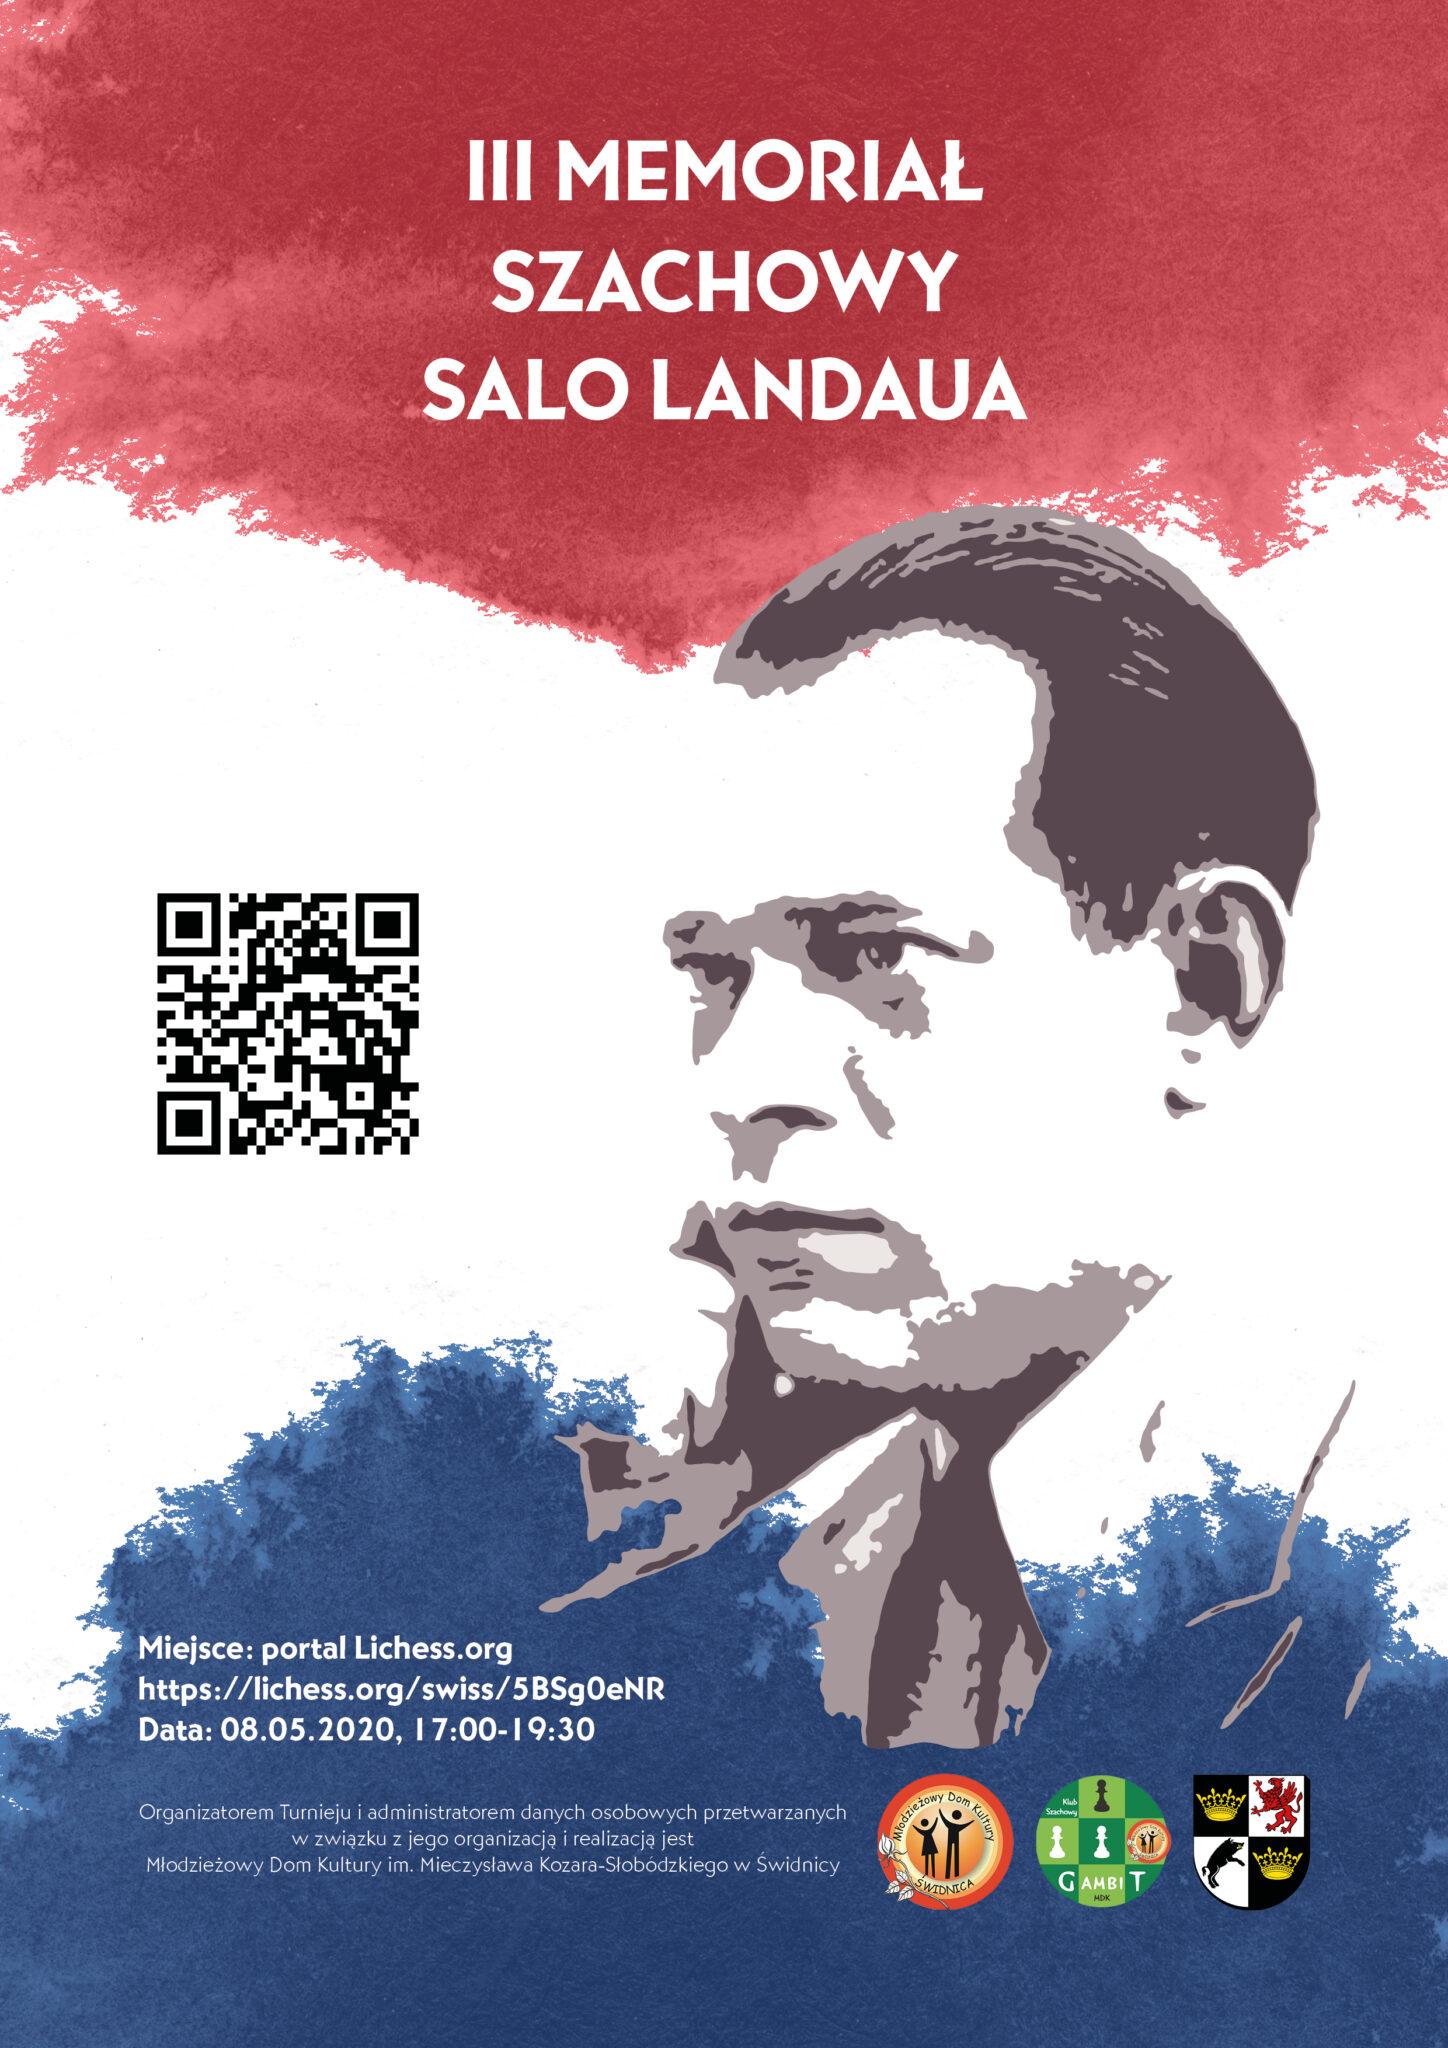 III Memoriał Szachowy Salo Landaua